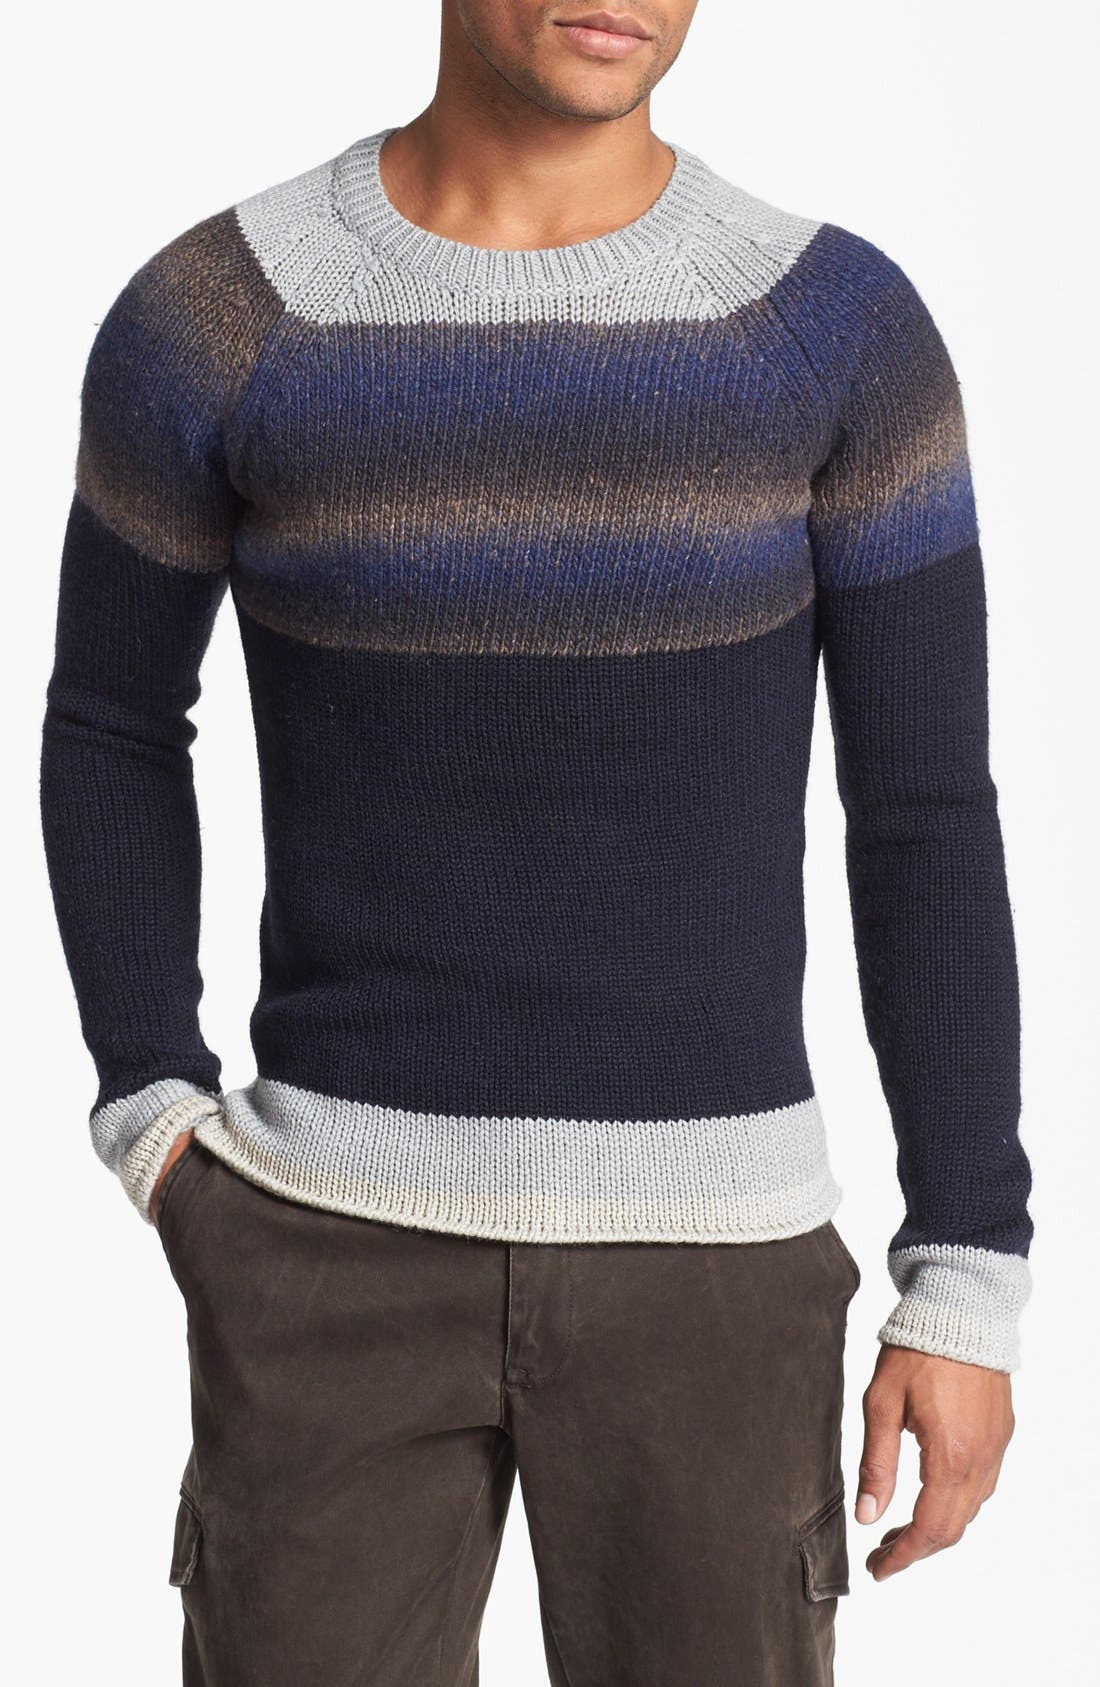 Alternate Image 1 Selected - Antony Morato Colorblock Crewneck Sweater